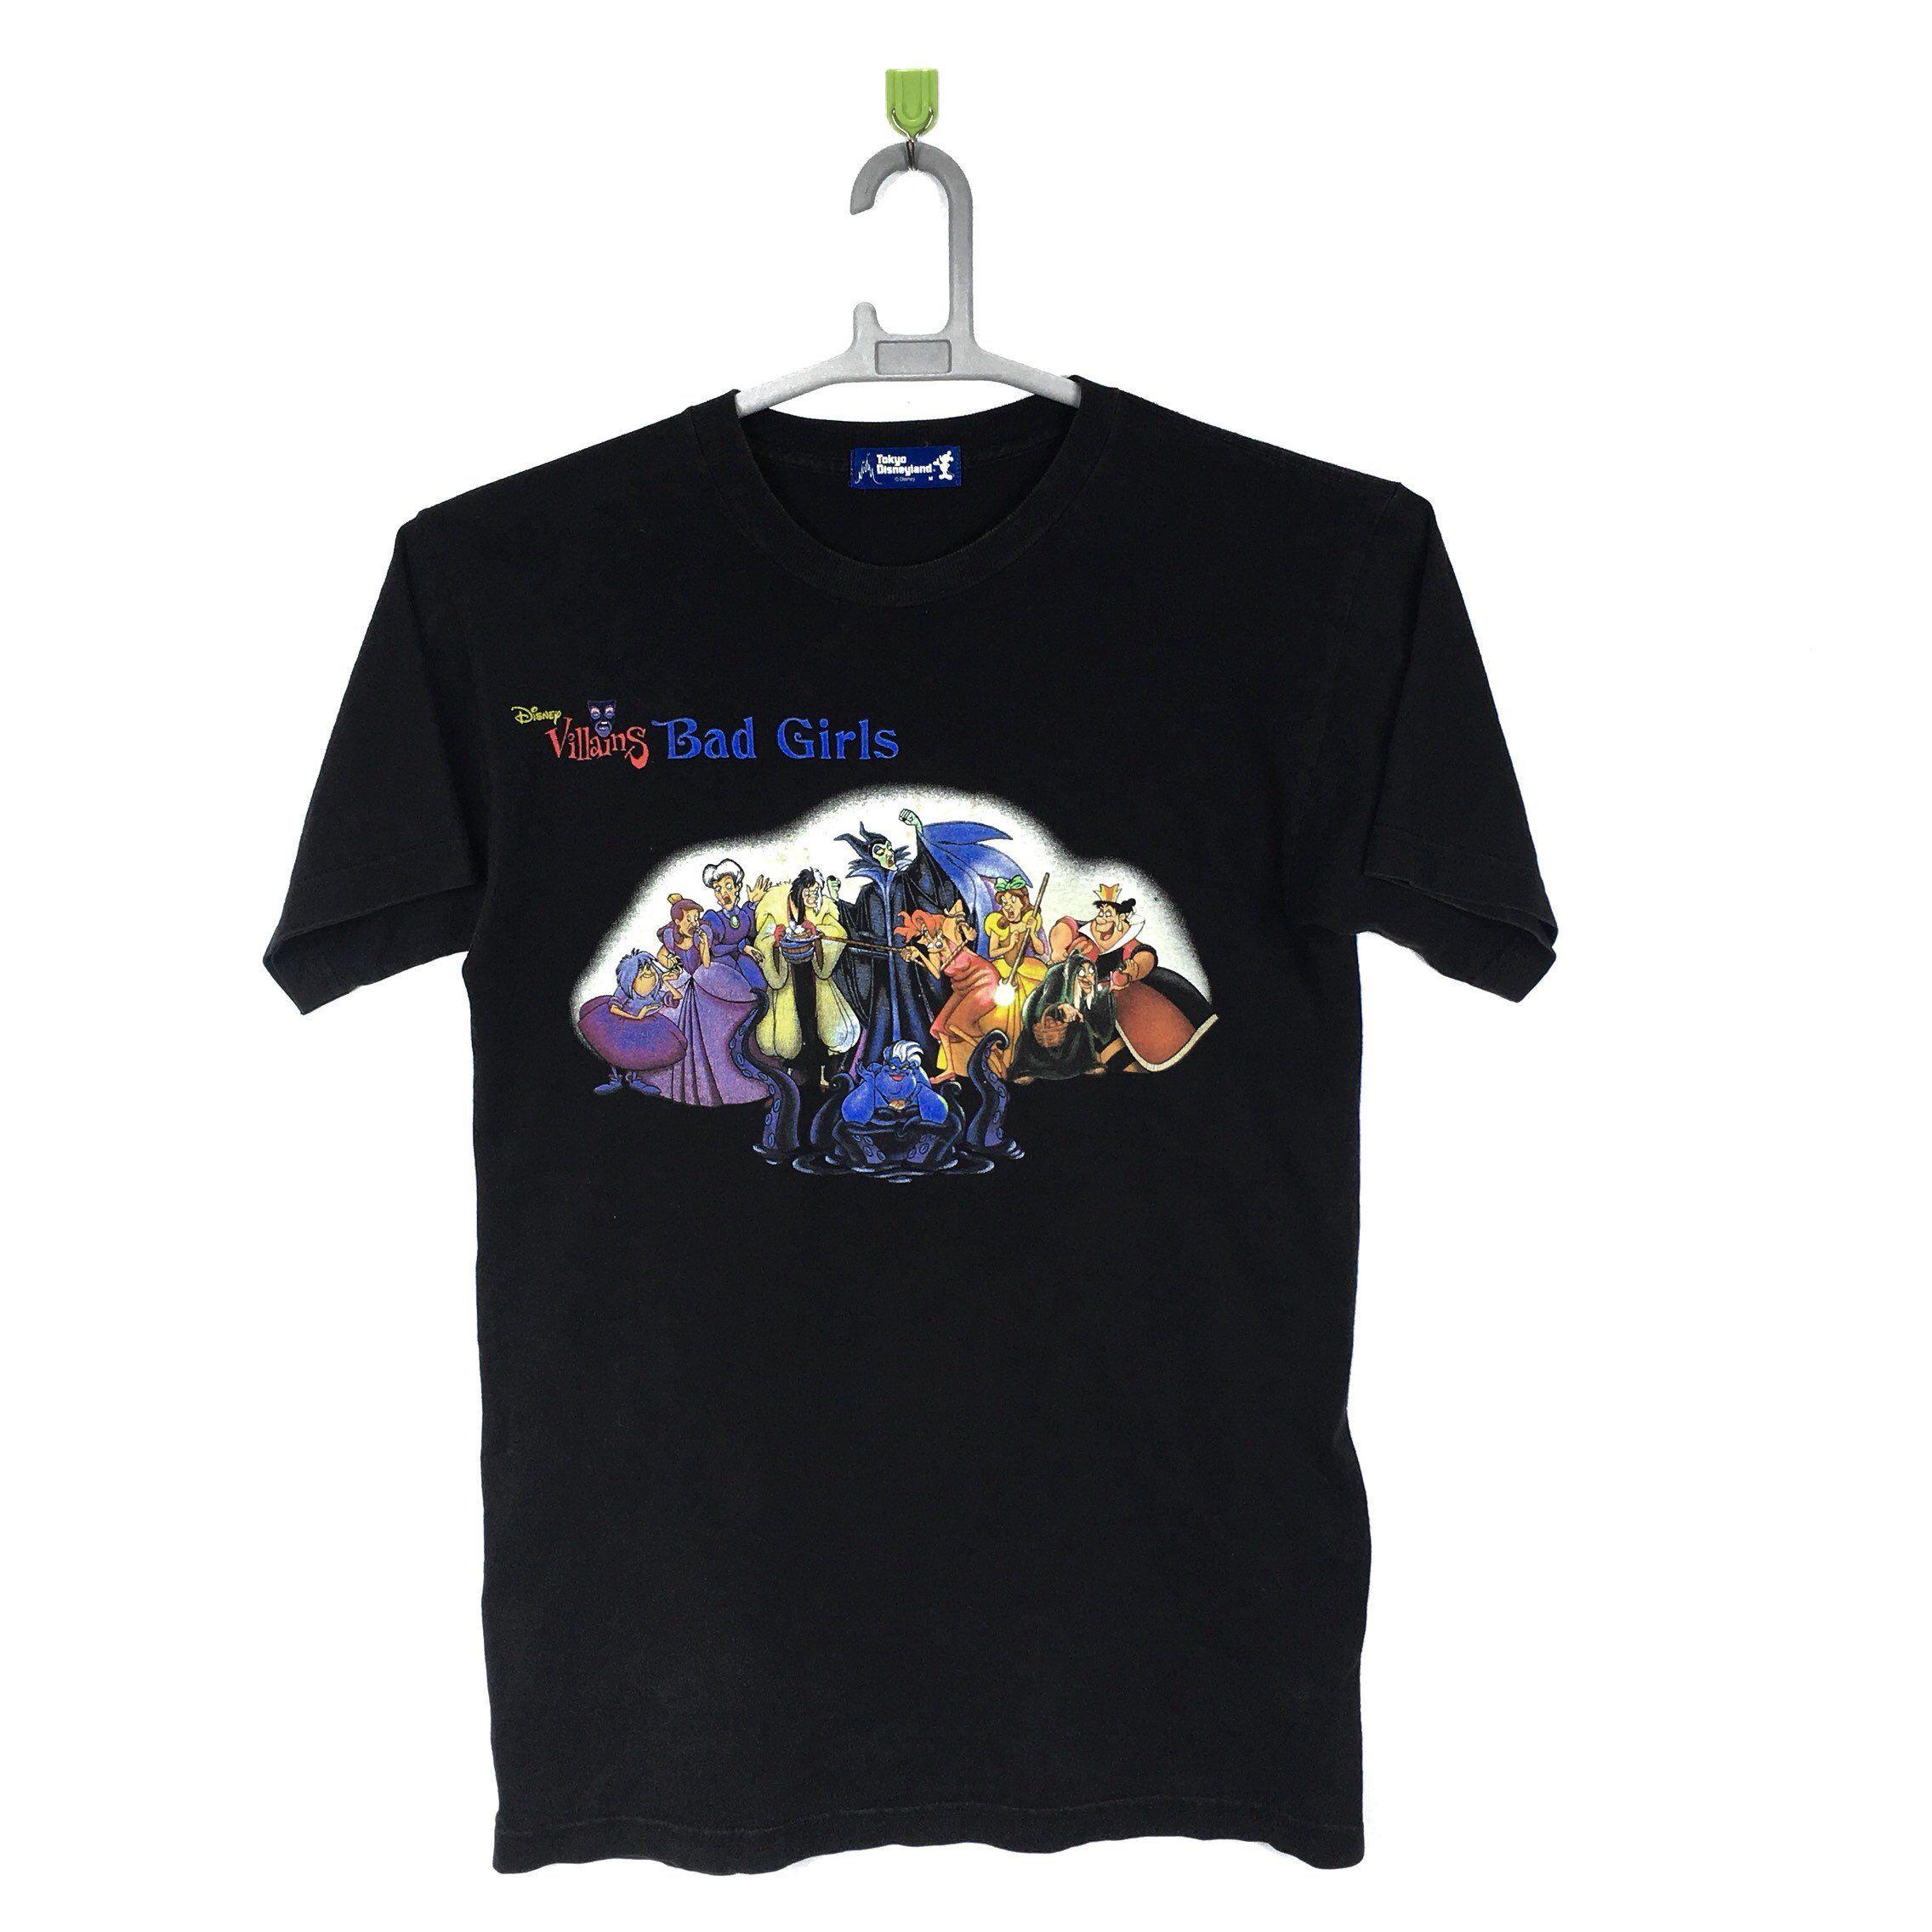 Vintage Disney Villains Bad Girls Character Cartoon T Shirt S Etsy Cartoon T Shirts Vintage Disney T Shirts S